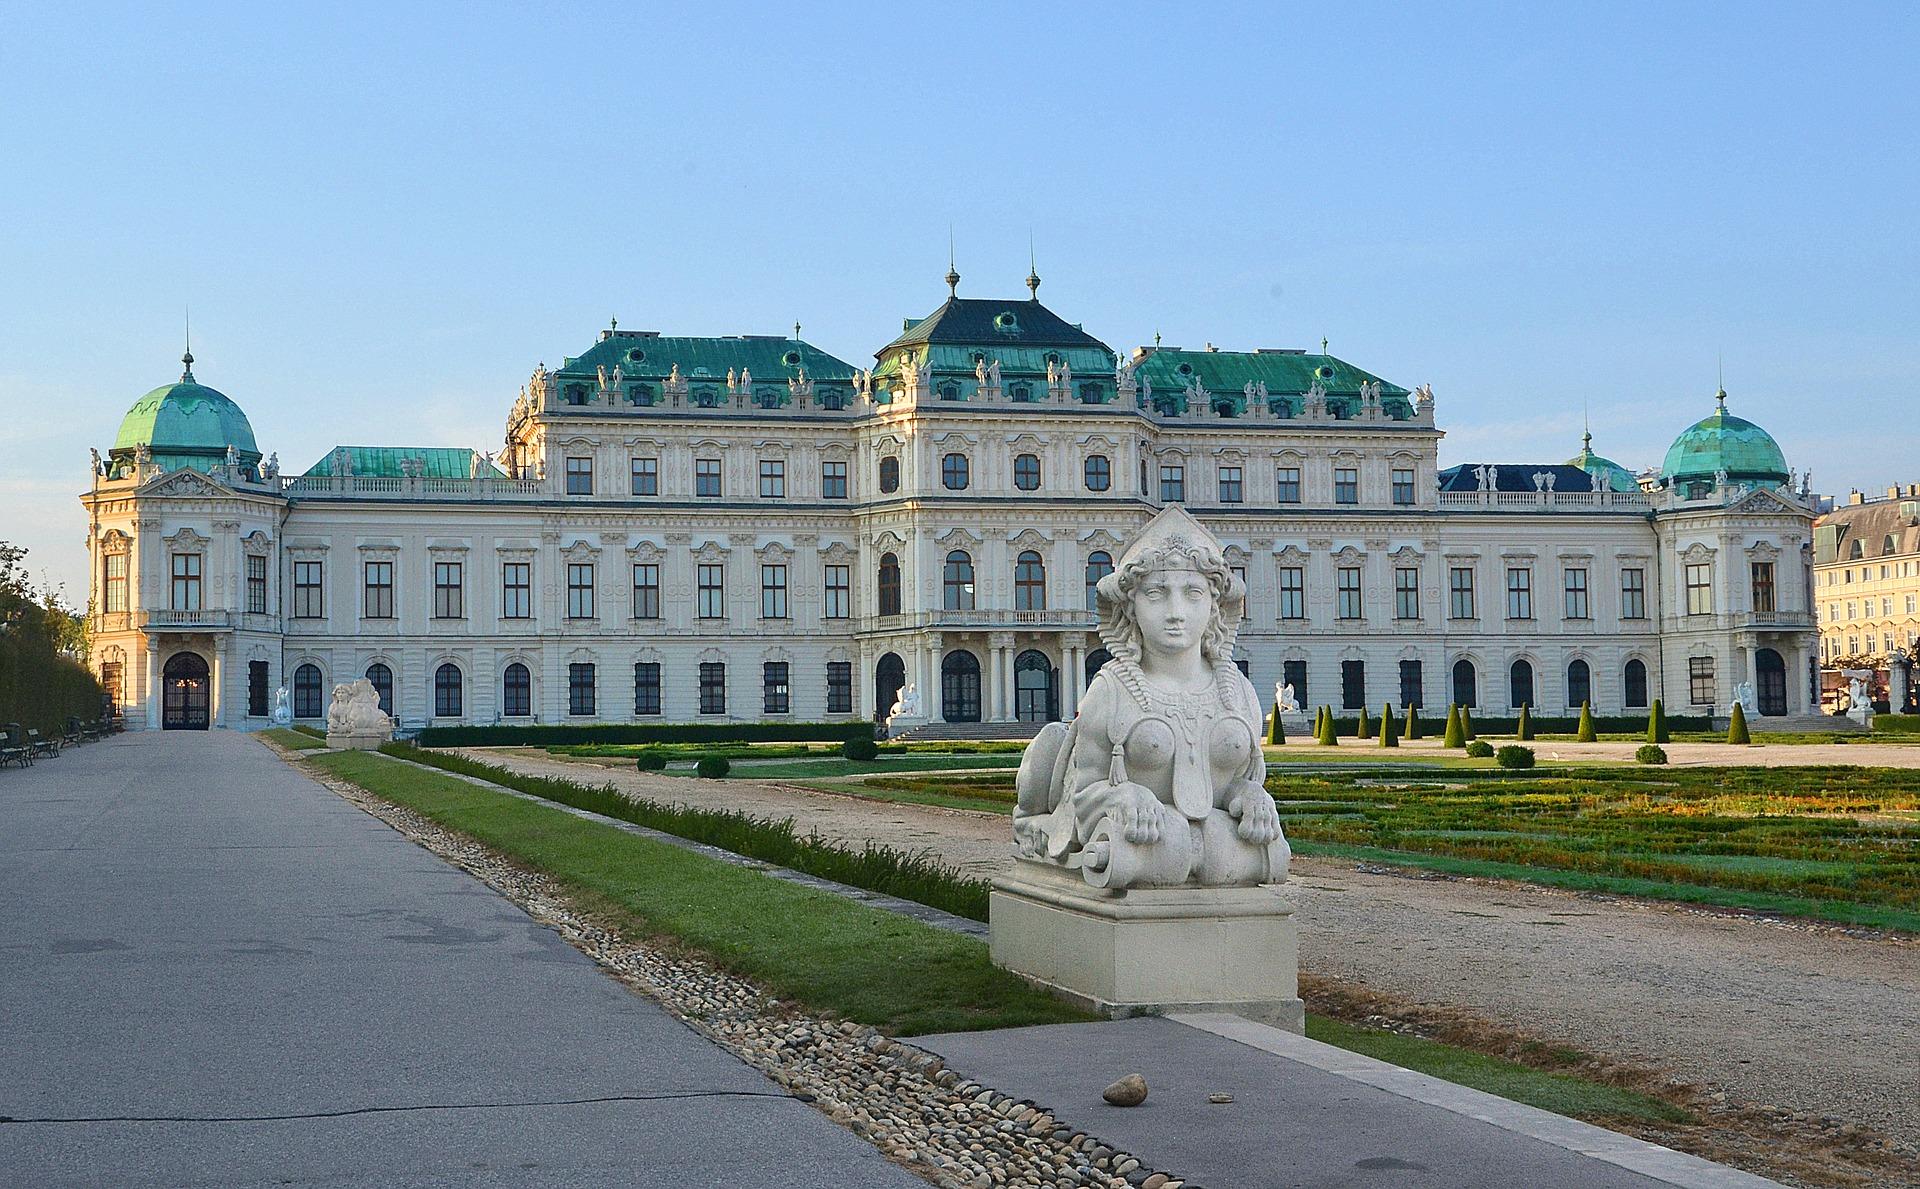 Schloss Belvedere, CC0 Public Domain, Anemone123/Pixabay